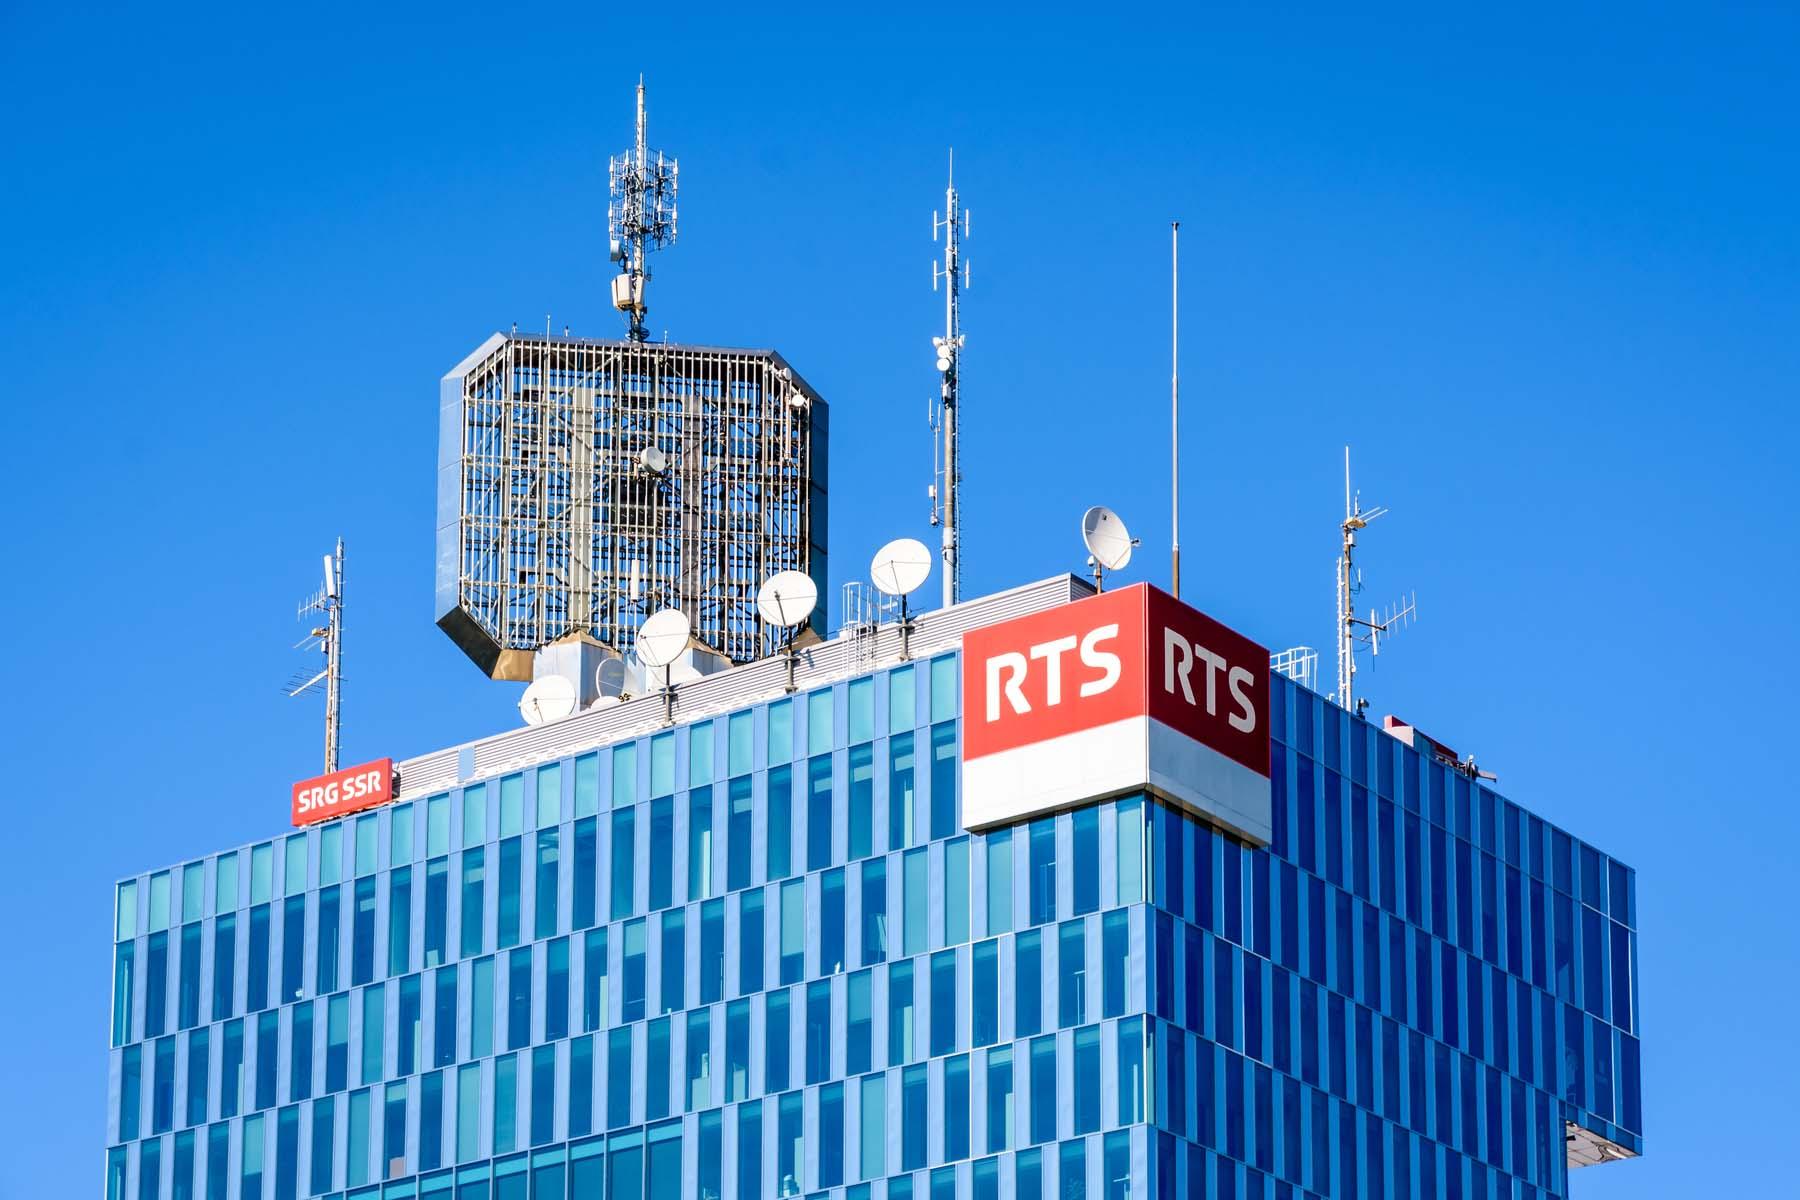 swiss broadcaster rts